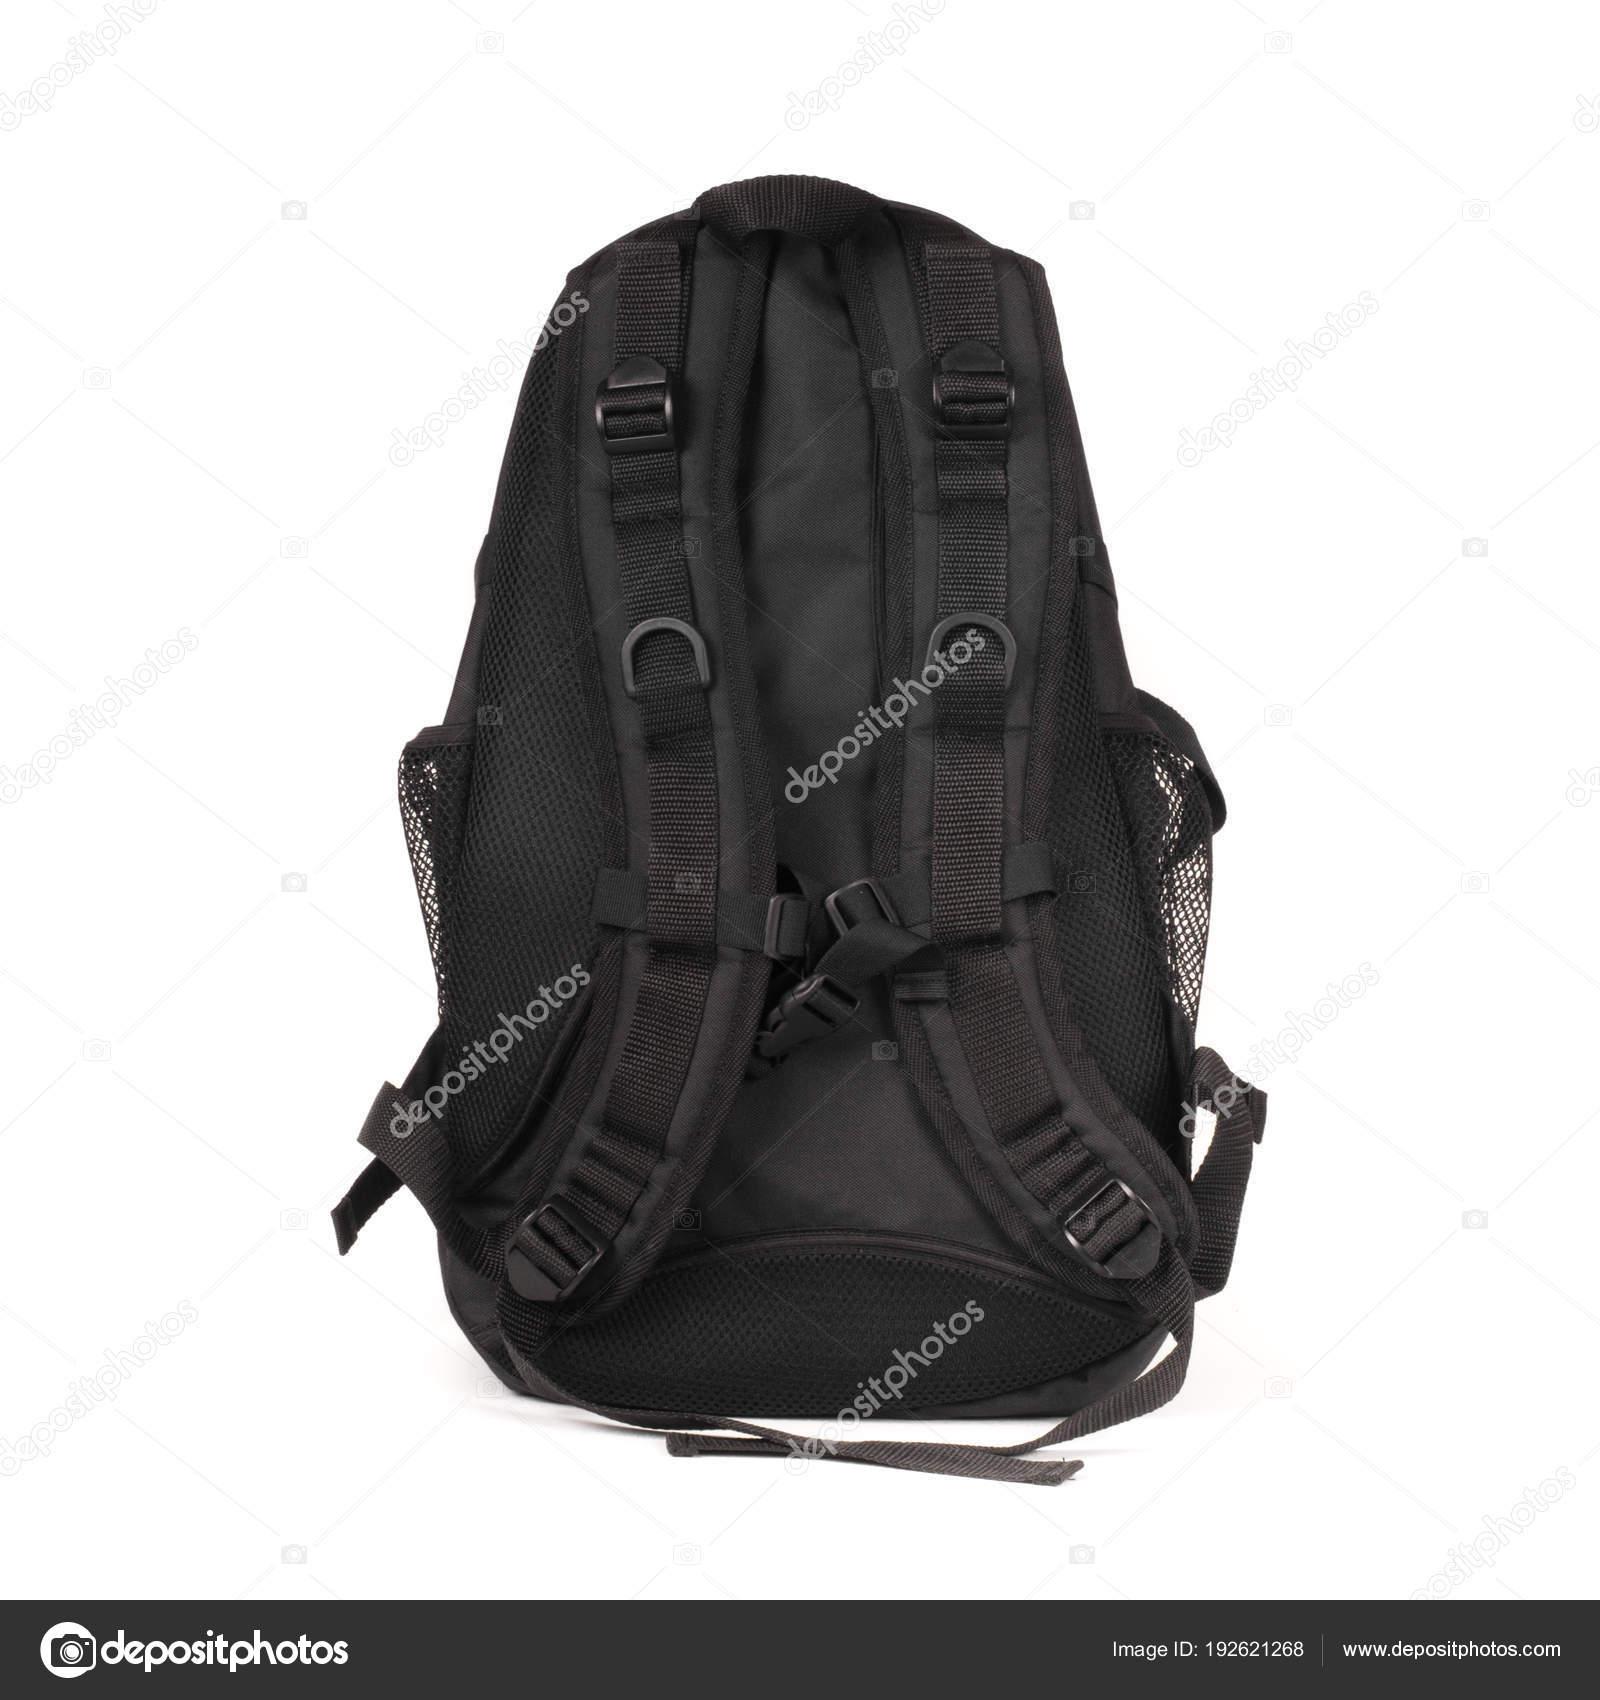 76cd2f0dbe1 Σακίδιο που απομονώνονται σε λευκό φόντο. Παιδική σχολική τσάντα,  χρωματιστό Χαρτοφύλακα για έφηβους — Εικόνα από ...